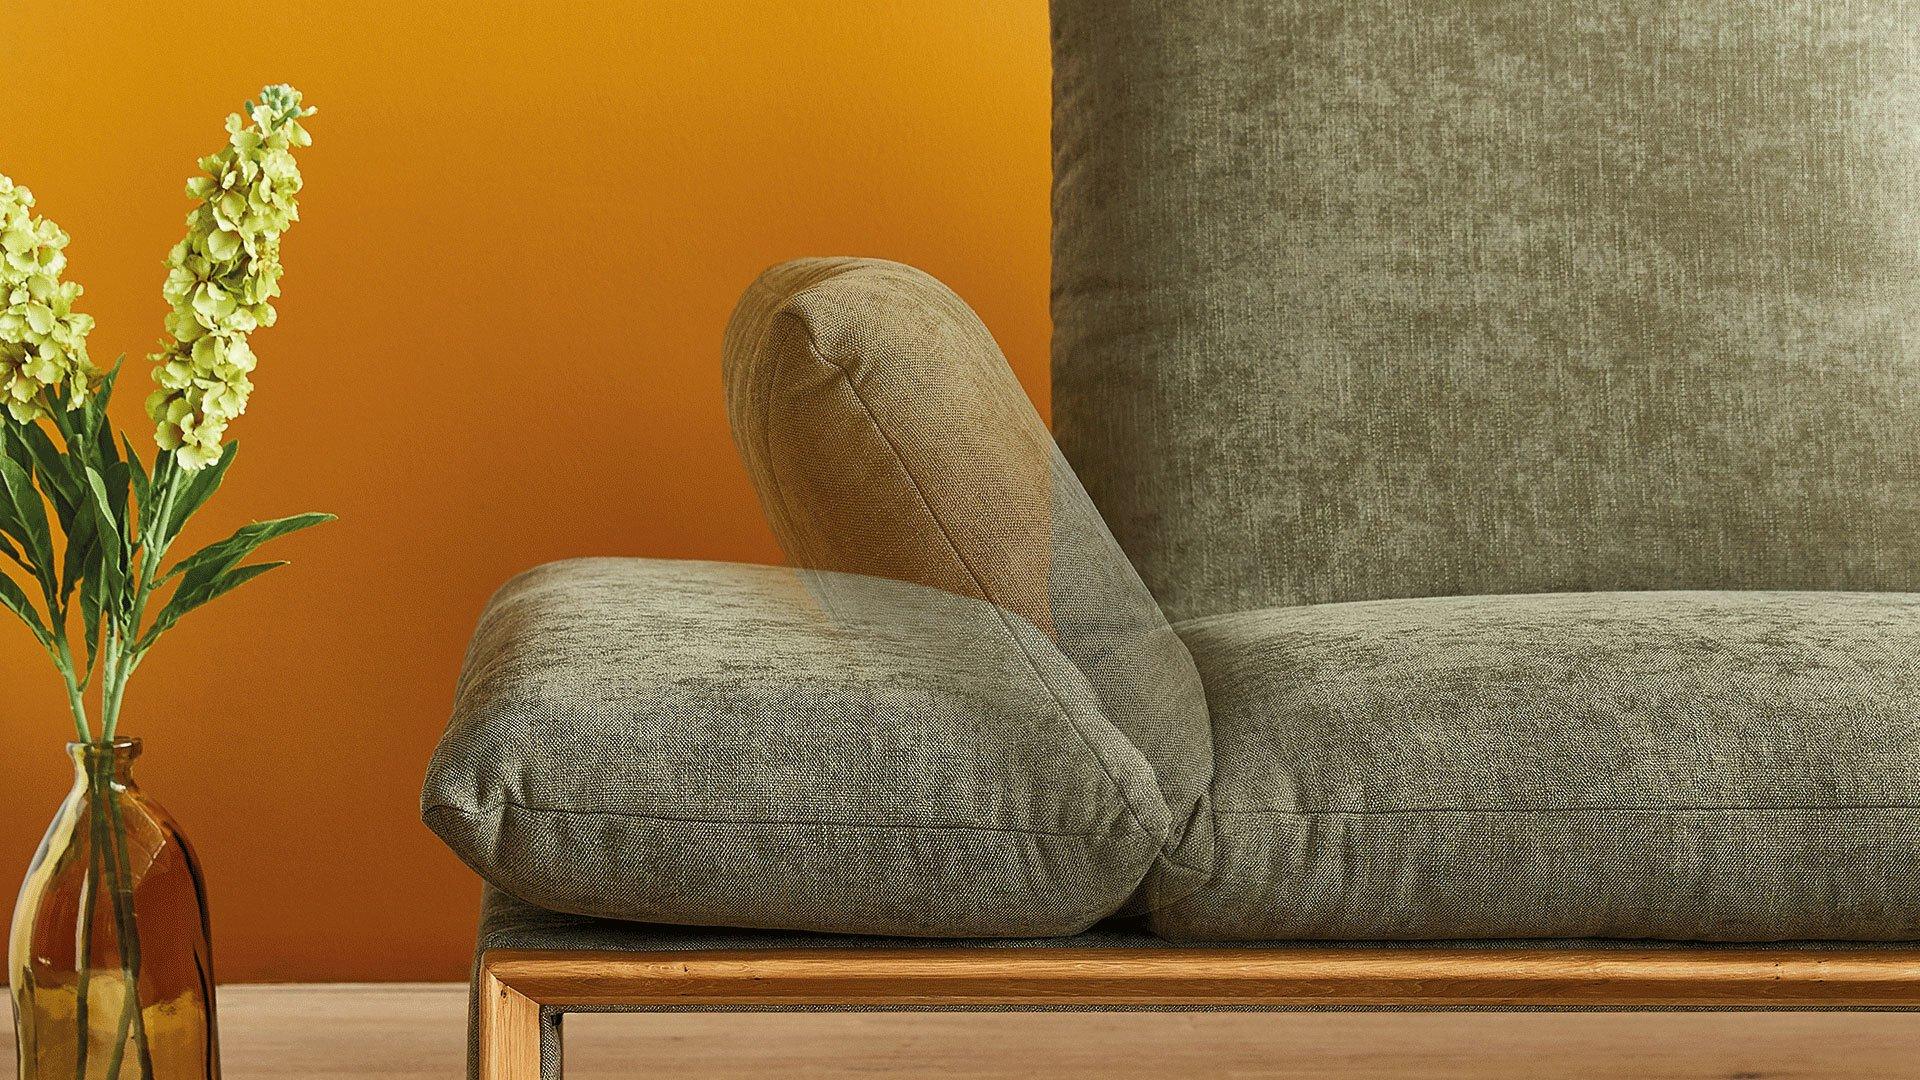 Ecksofa HARRIET Koinor Textil grün 92 x 73 x 222 cm